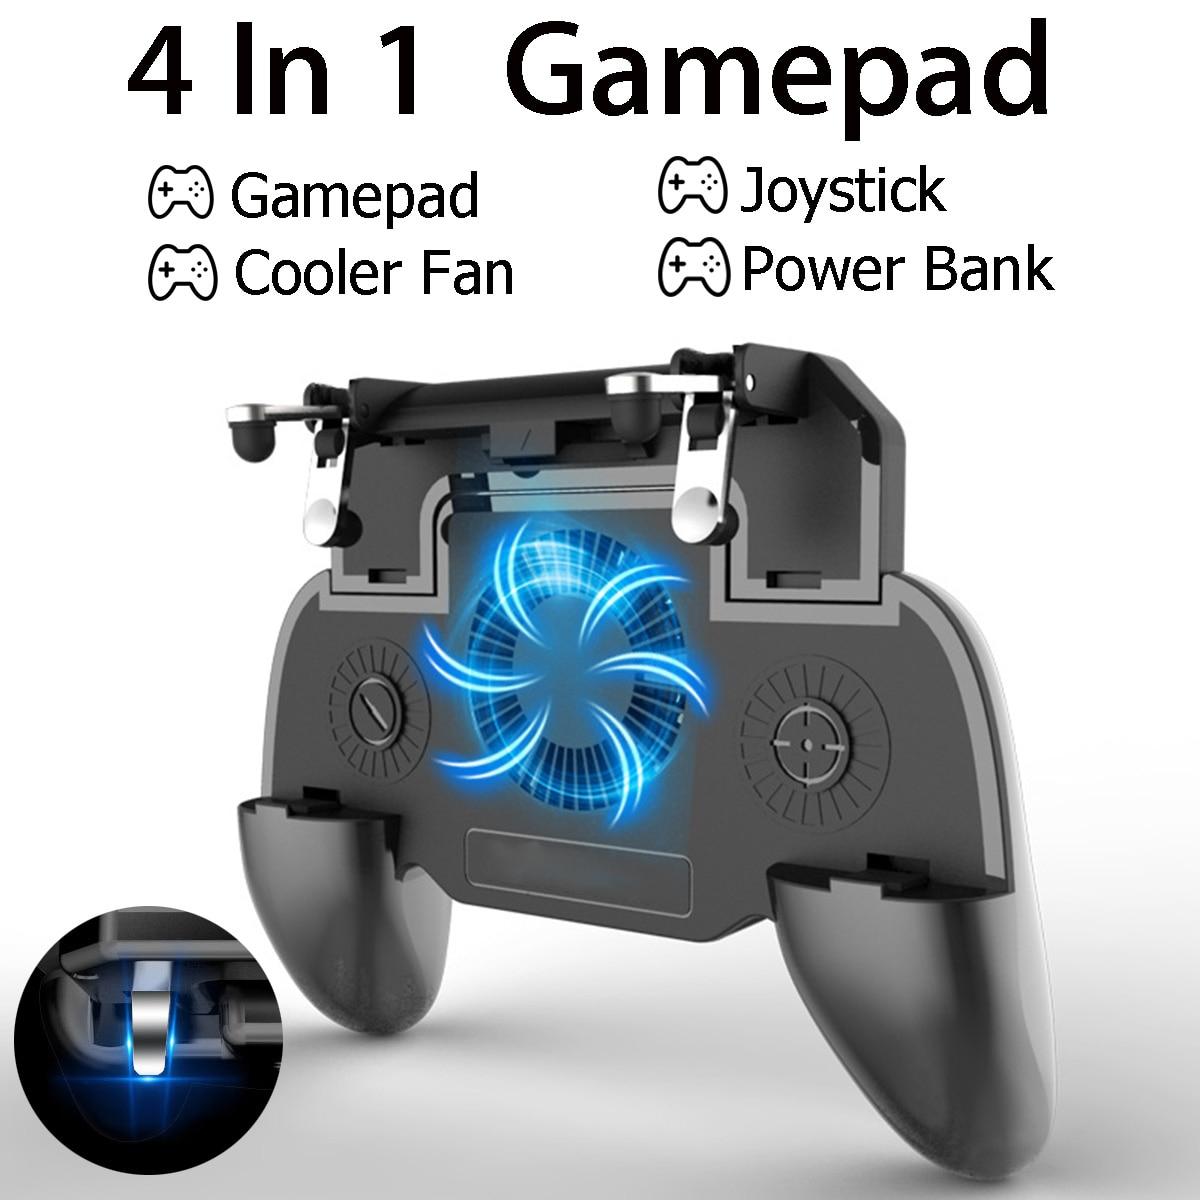 Móvel gamepad joystick para pubg cooler fan l1 r1 atirador controlador lidar com smartphone gatilho com 2000/4000 mah power bank